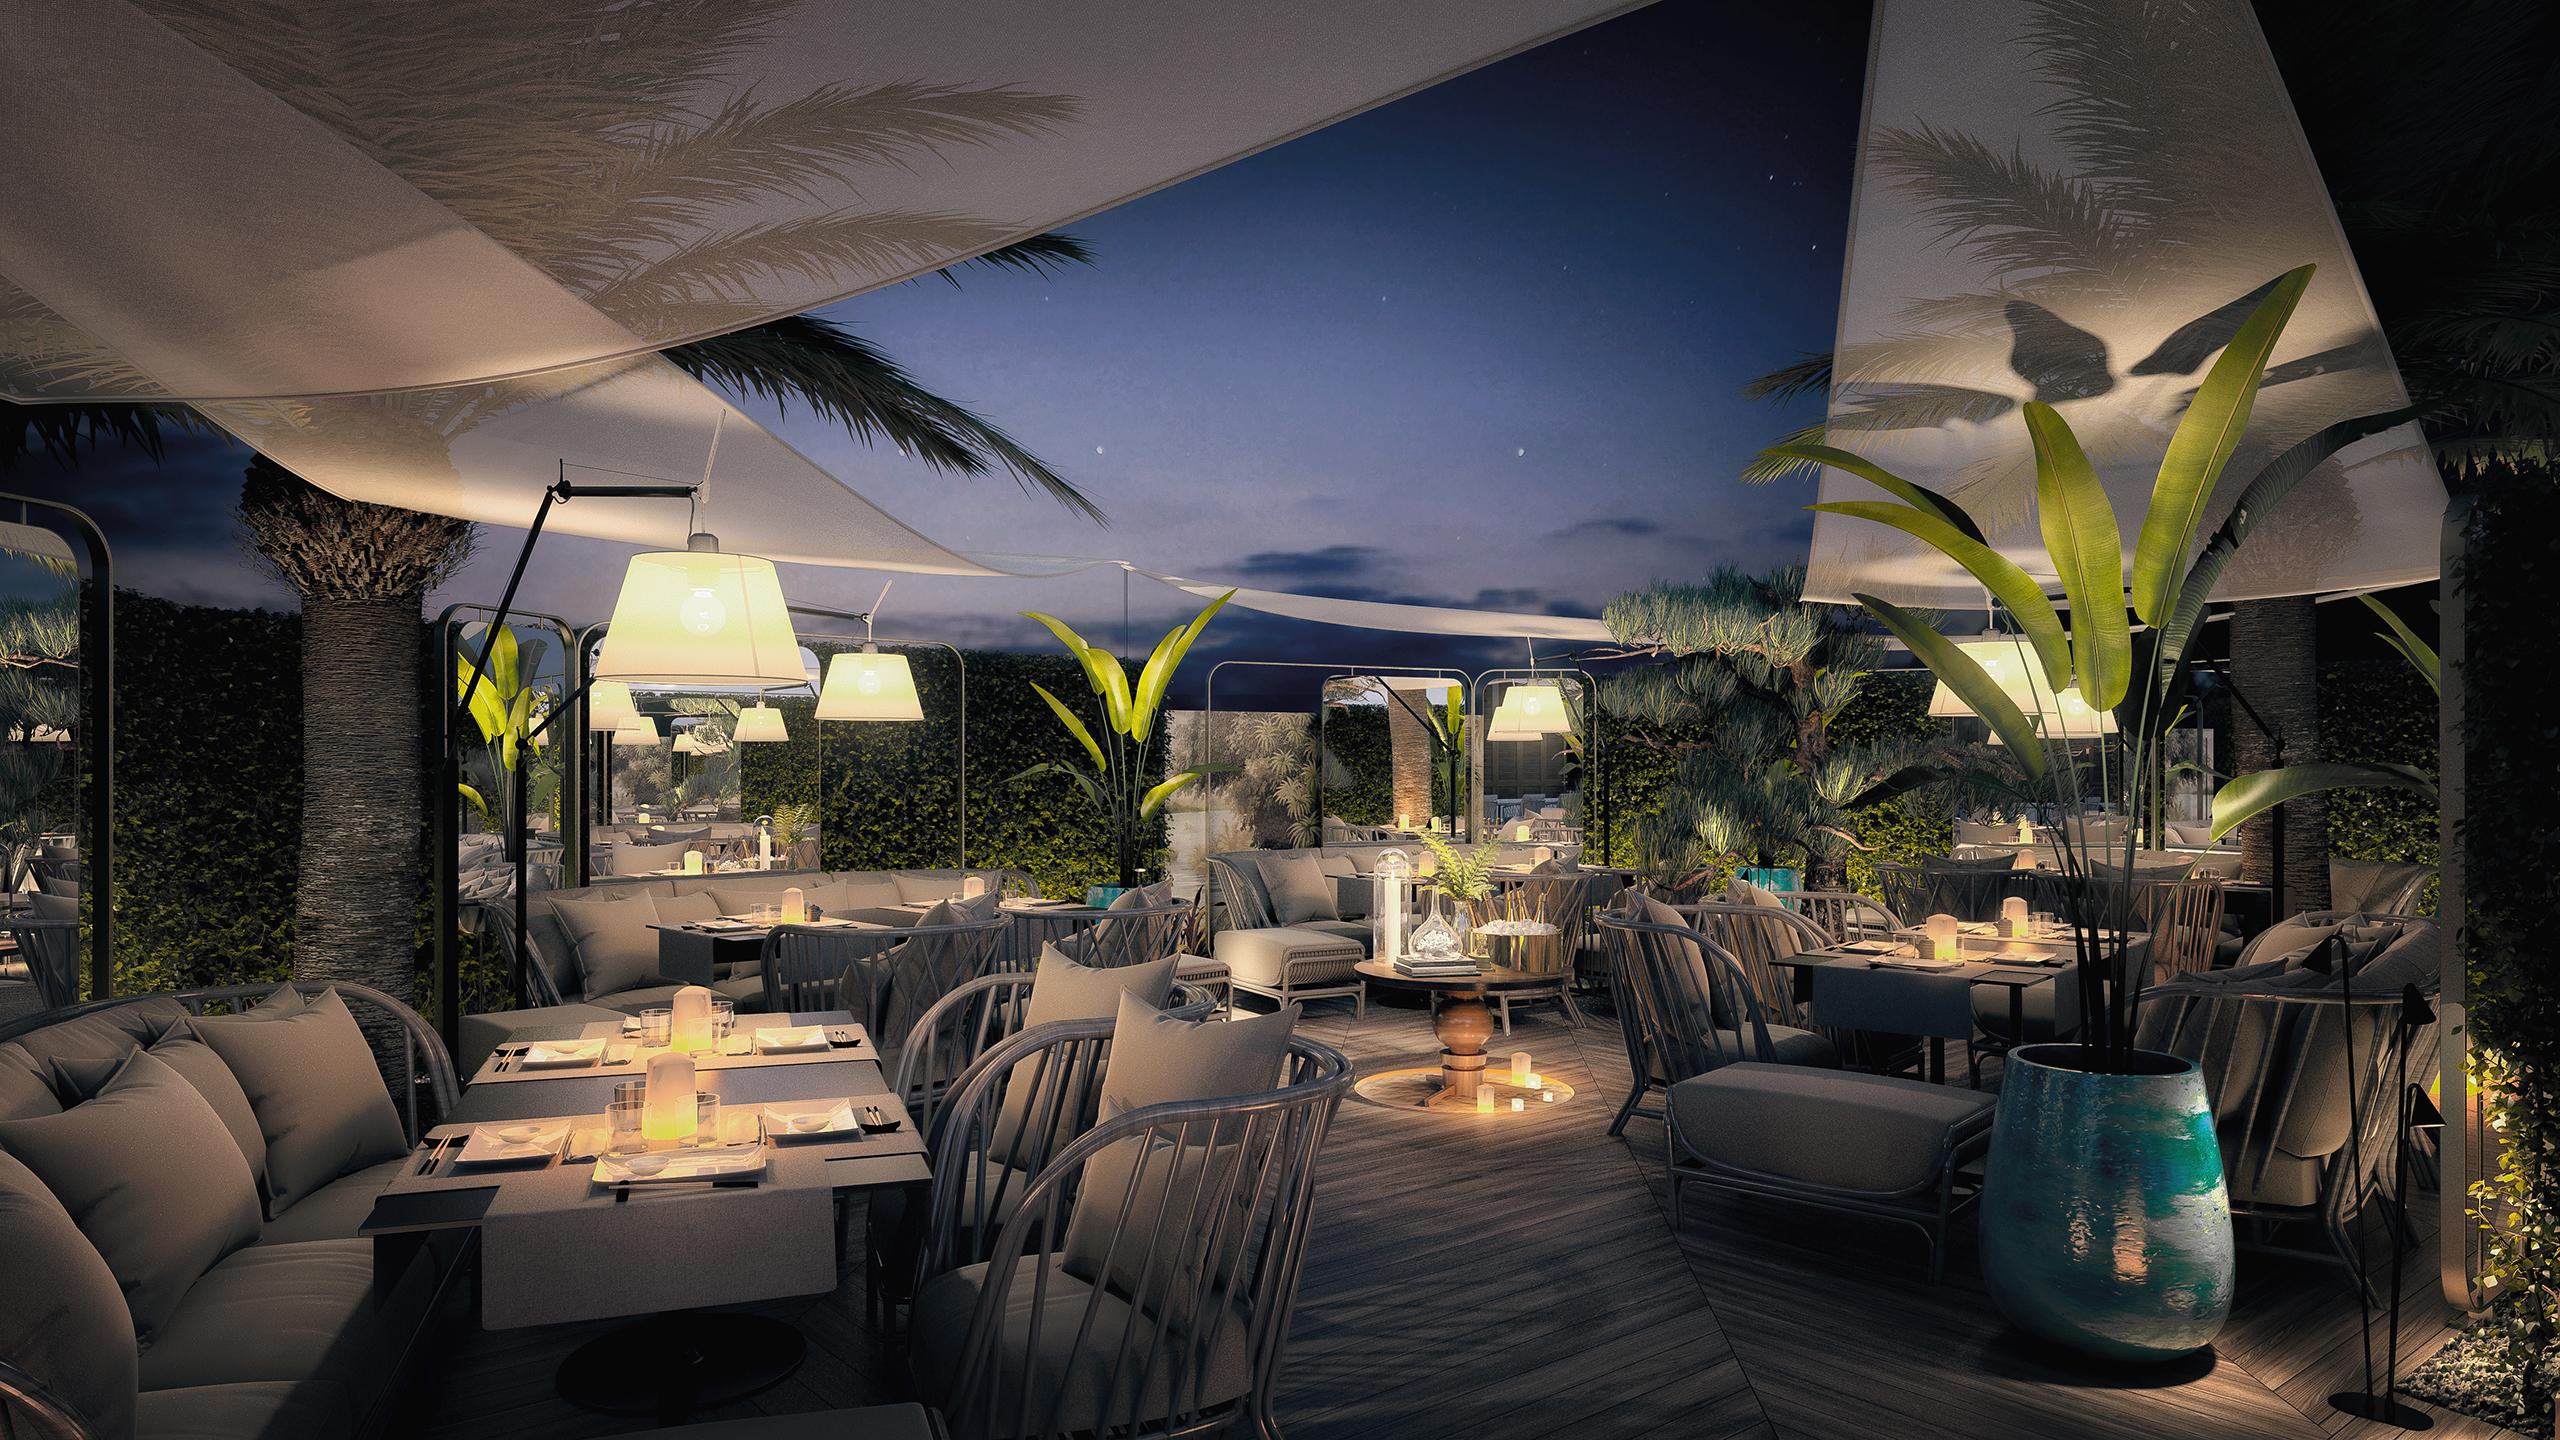 Zela Restaurant in Ibiza